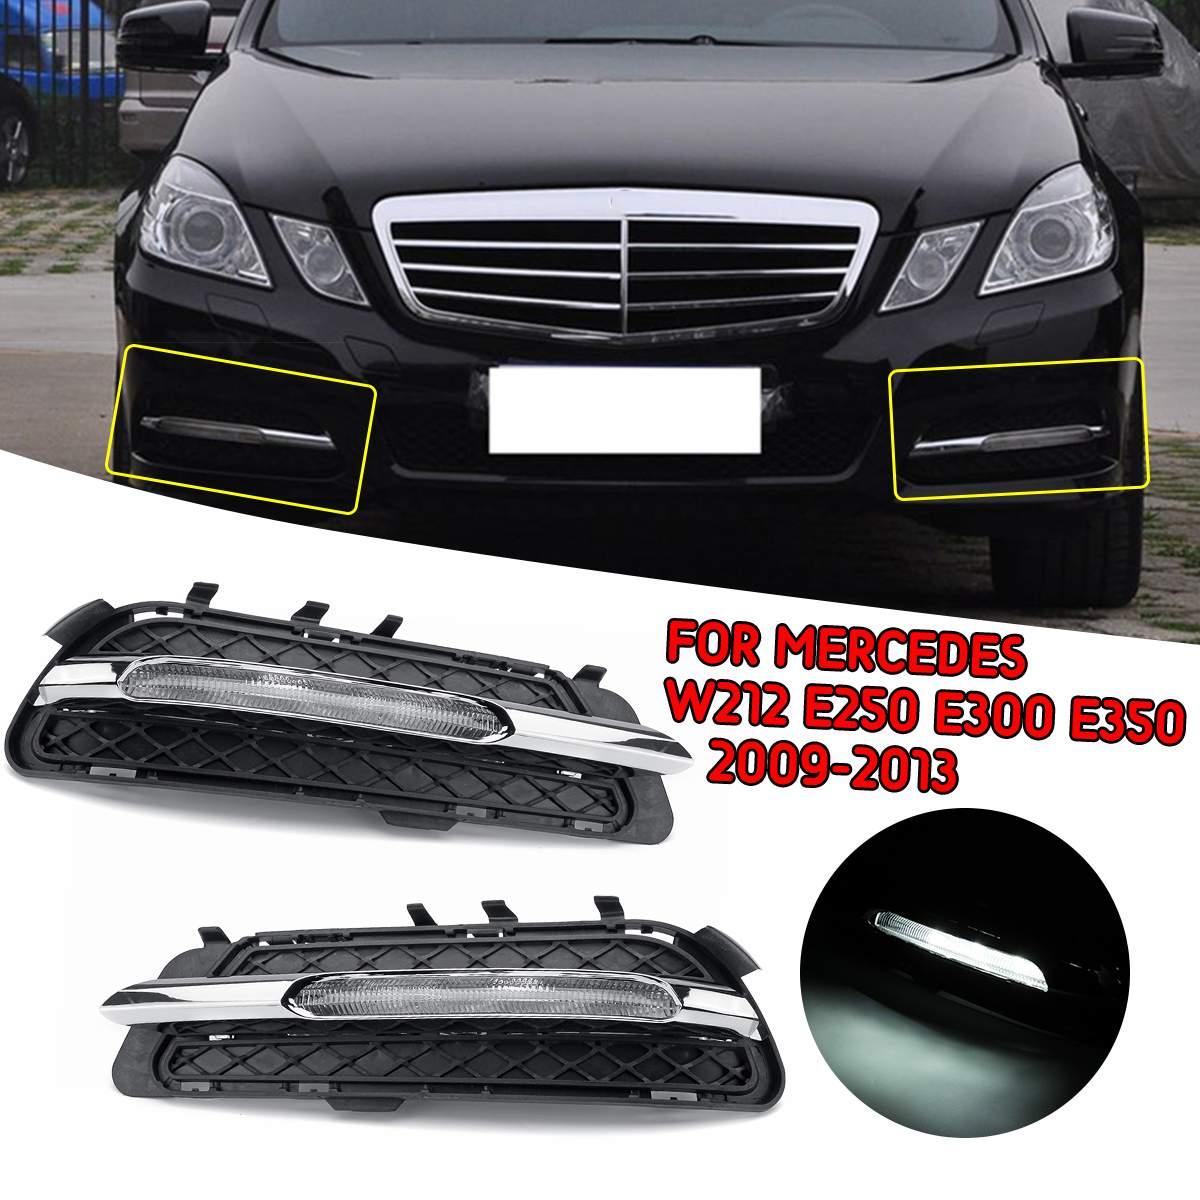 Bumper Trim For 2010-2013 Mercedes Benz E350 E550 Front Left Side